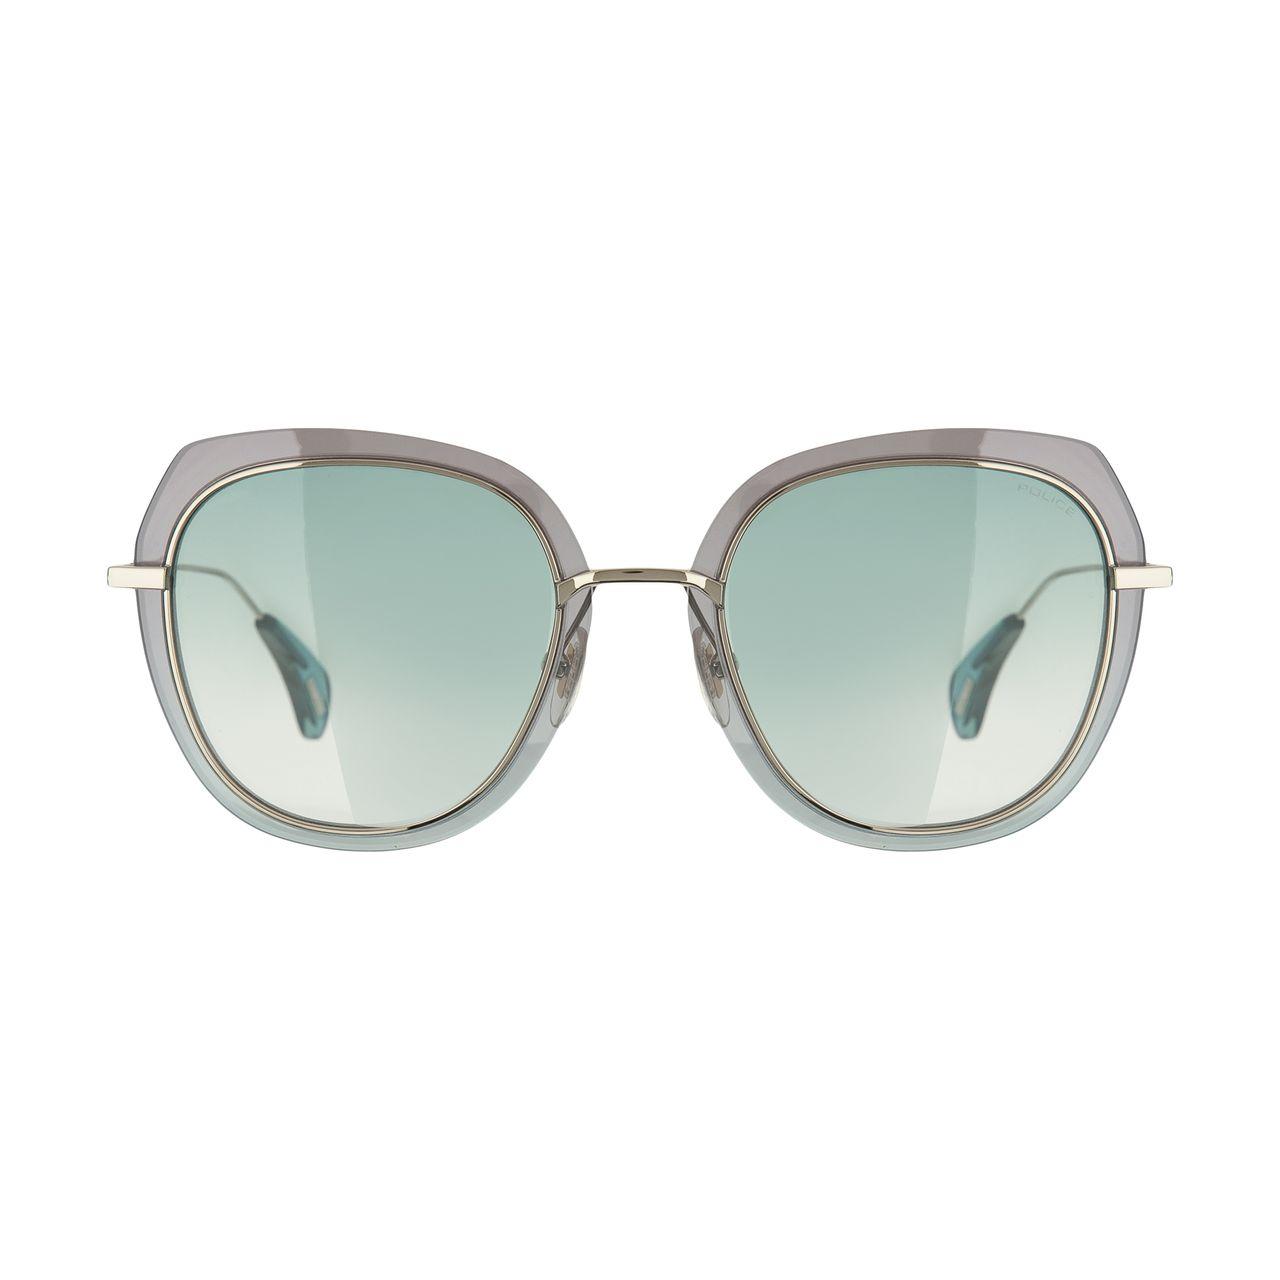 عینک آفتابی زنانه پلیس مدل SPL831M 0594